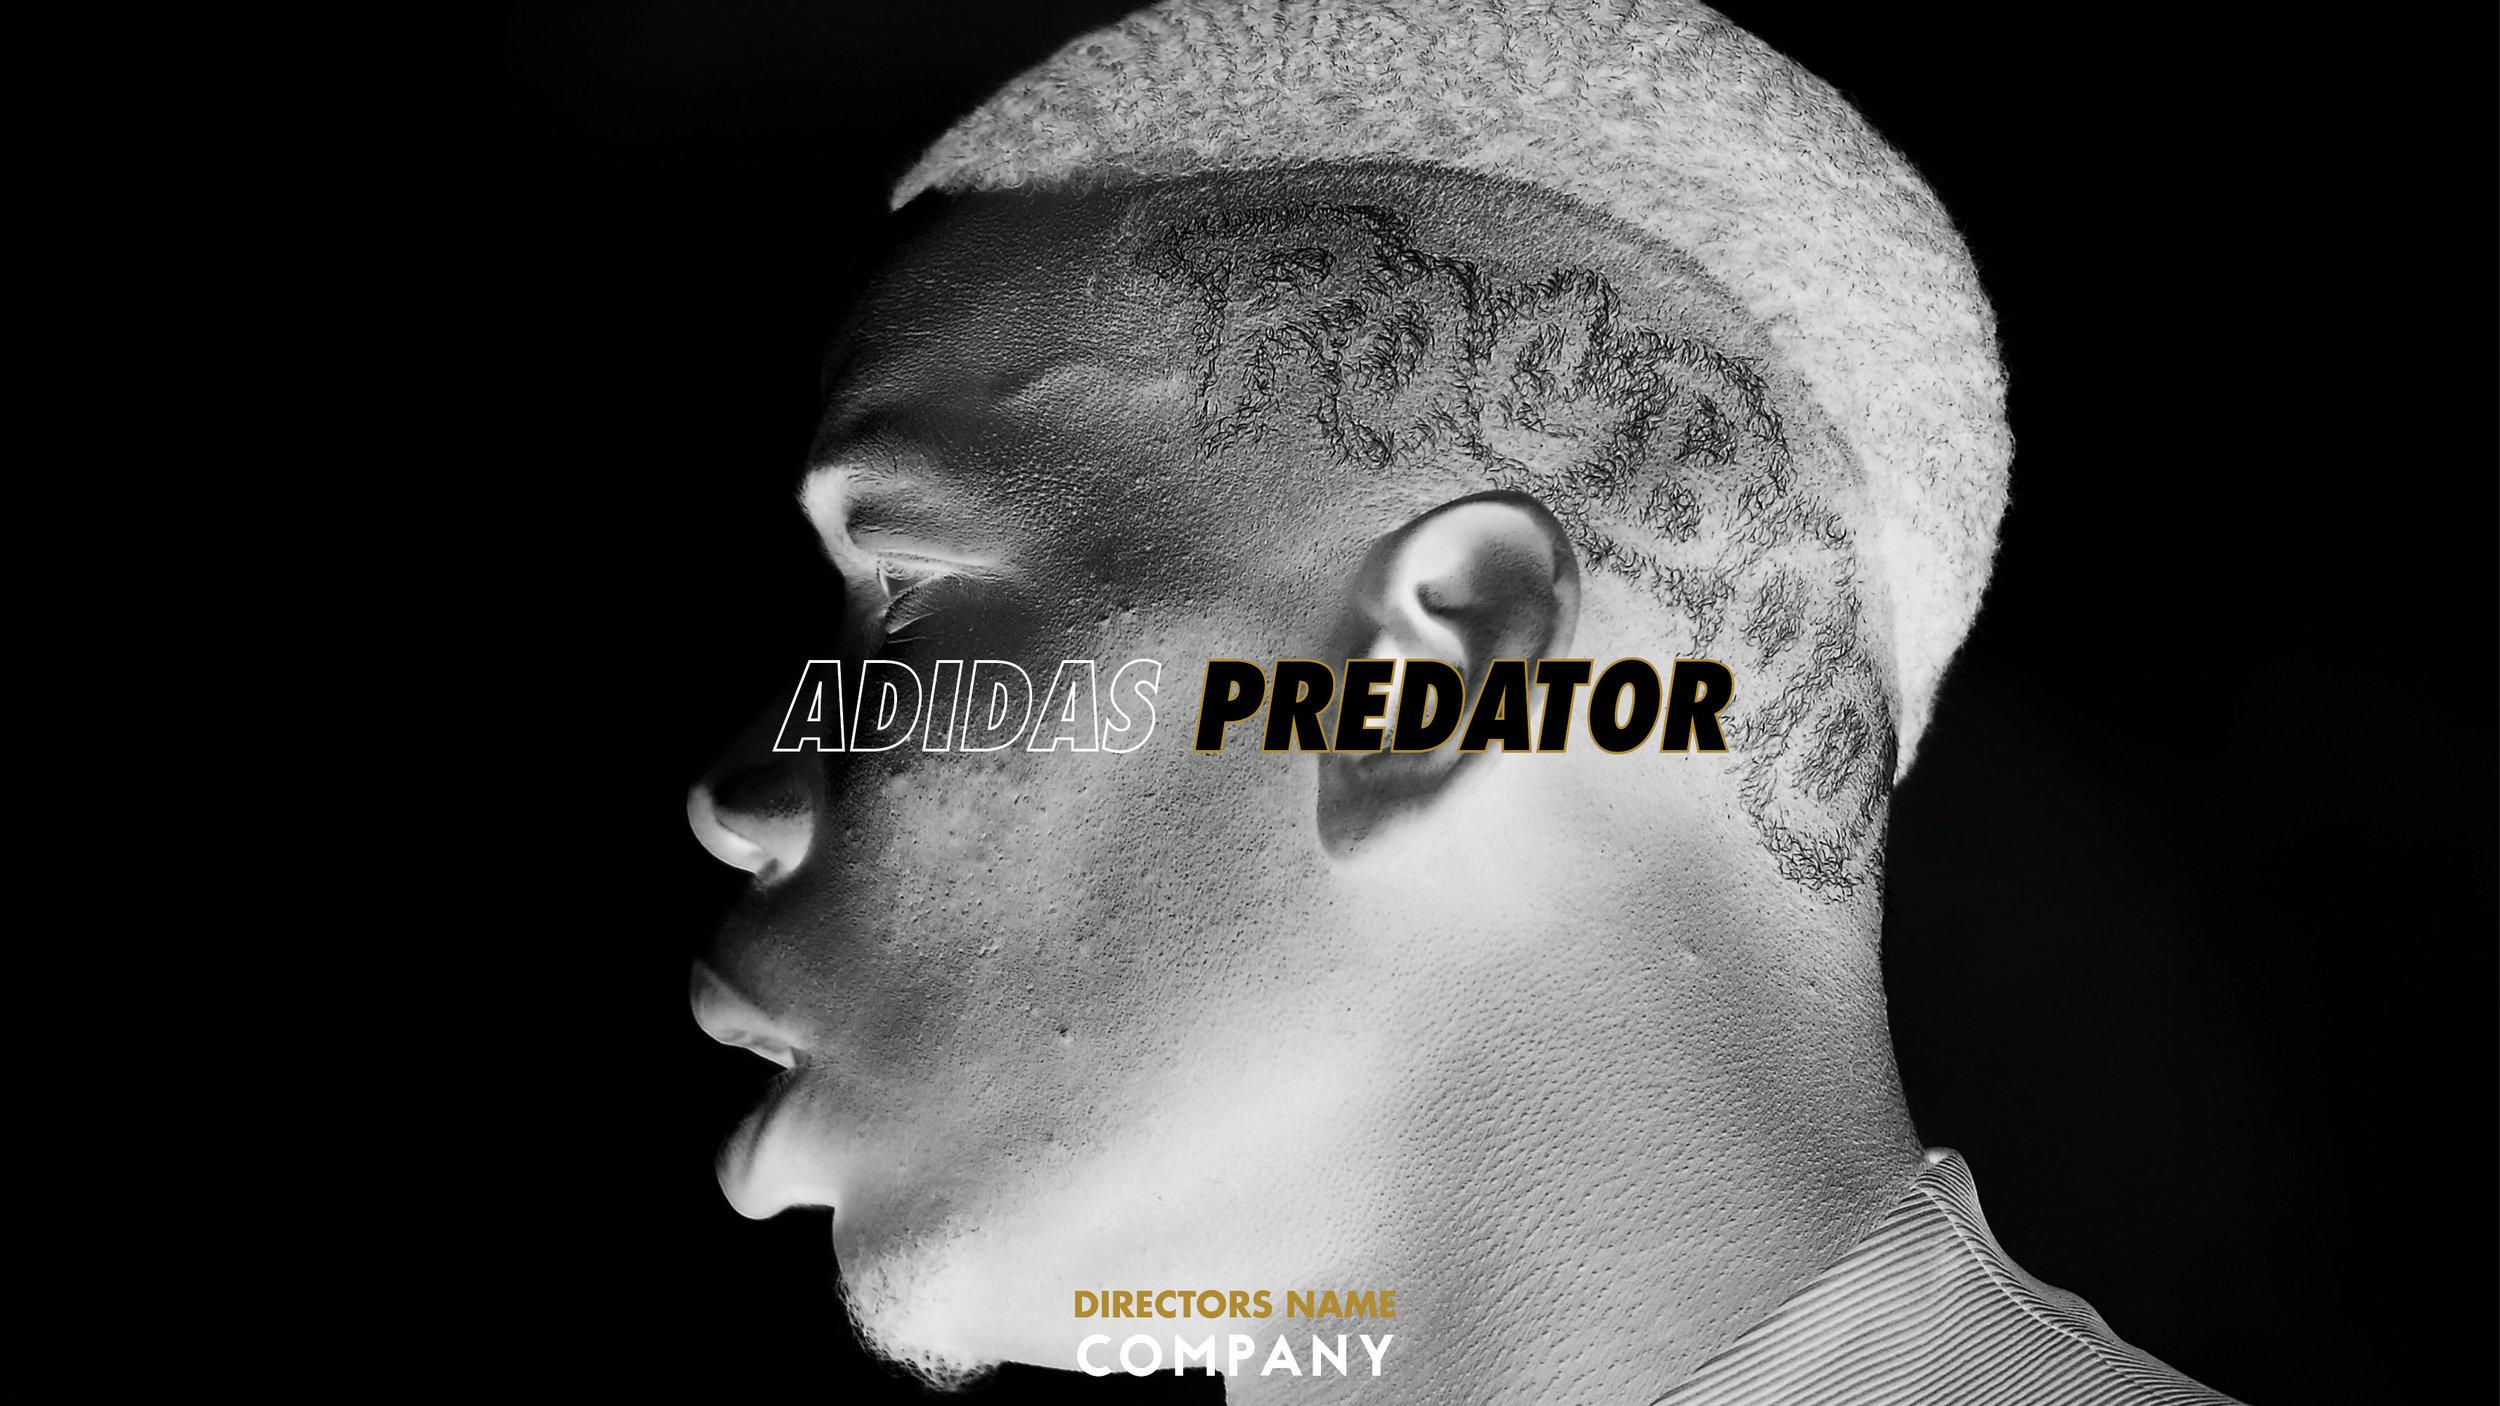 Adidas Predator.jpg